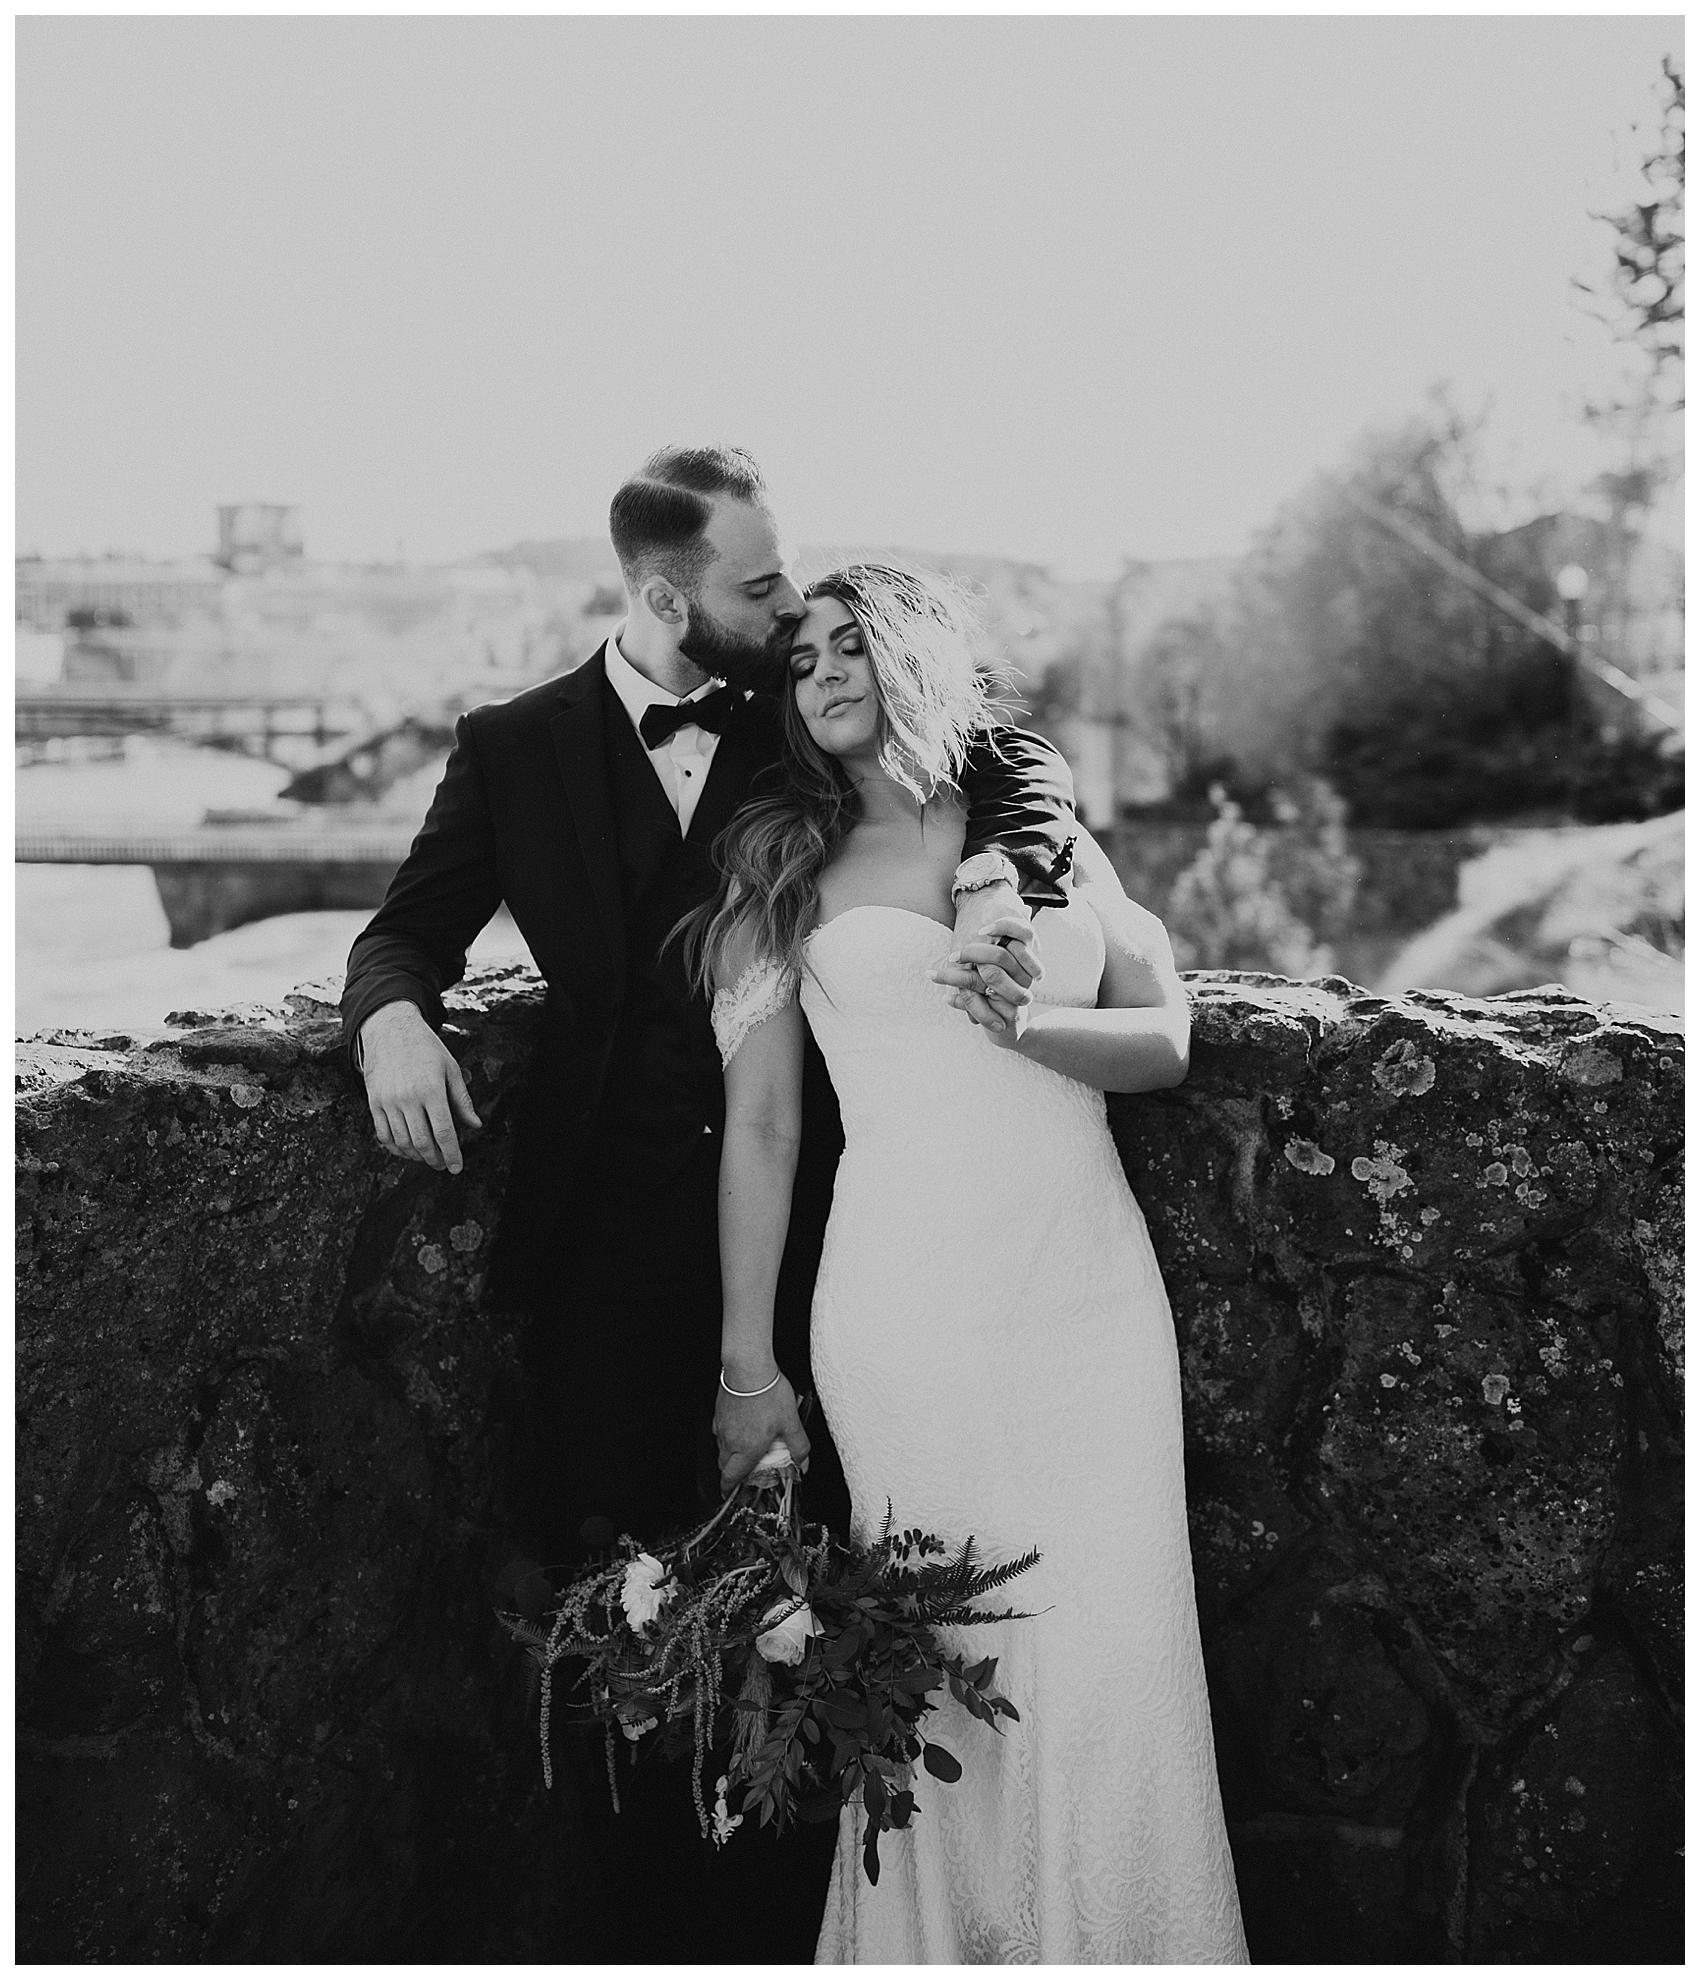 Chateau Rive Spokane Wedding Cassie Trottier Photography01092.jpg